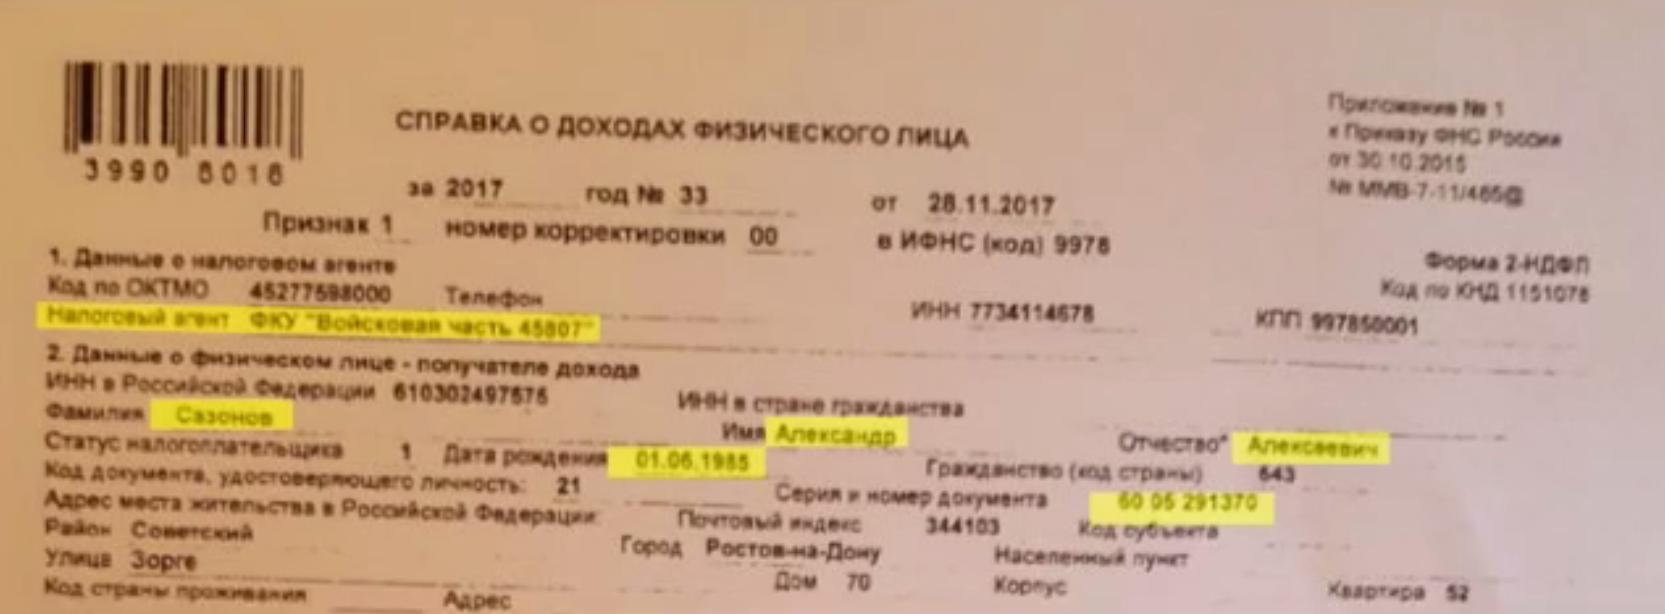 Документ сотрудник ГРУ РФ